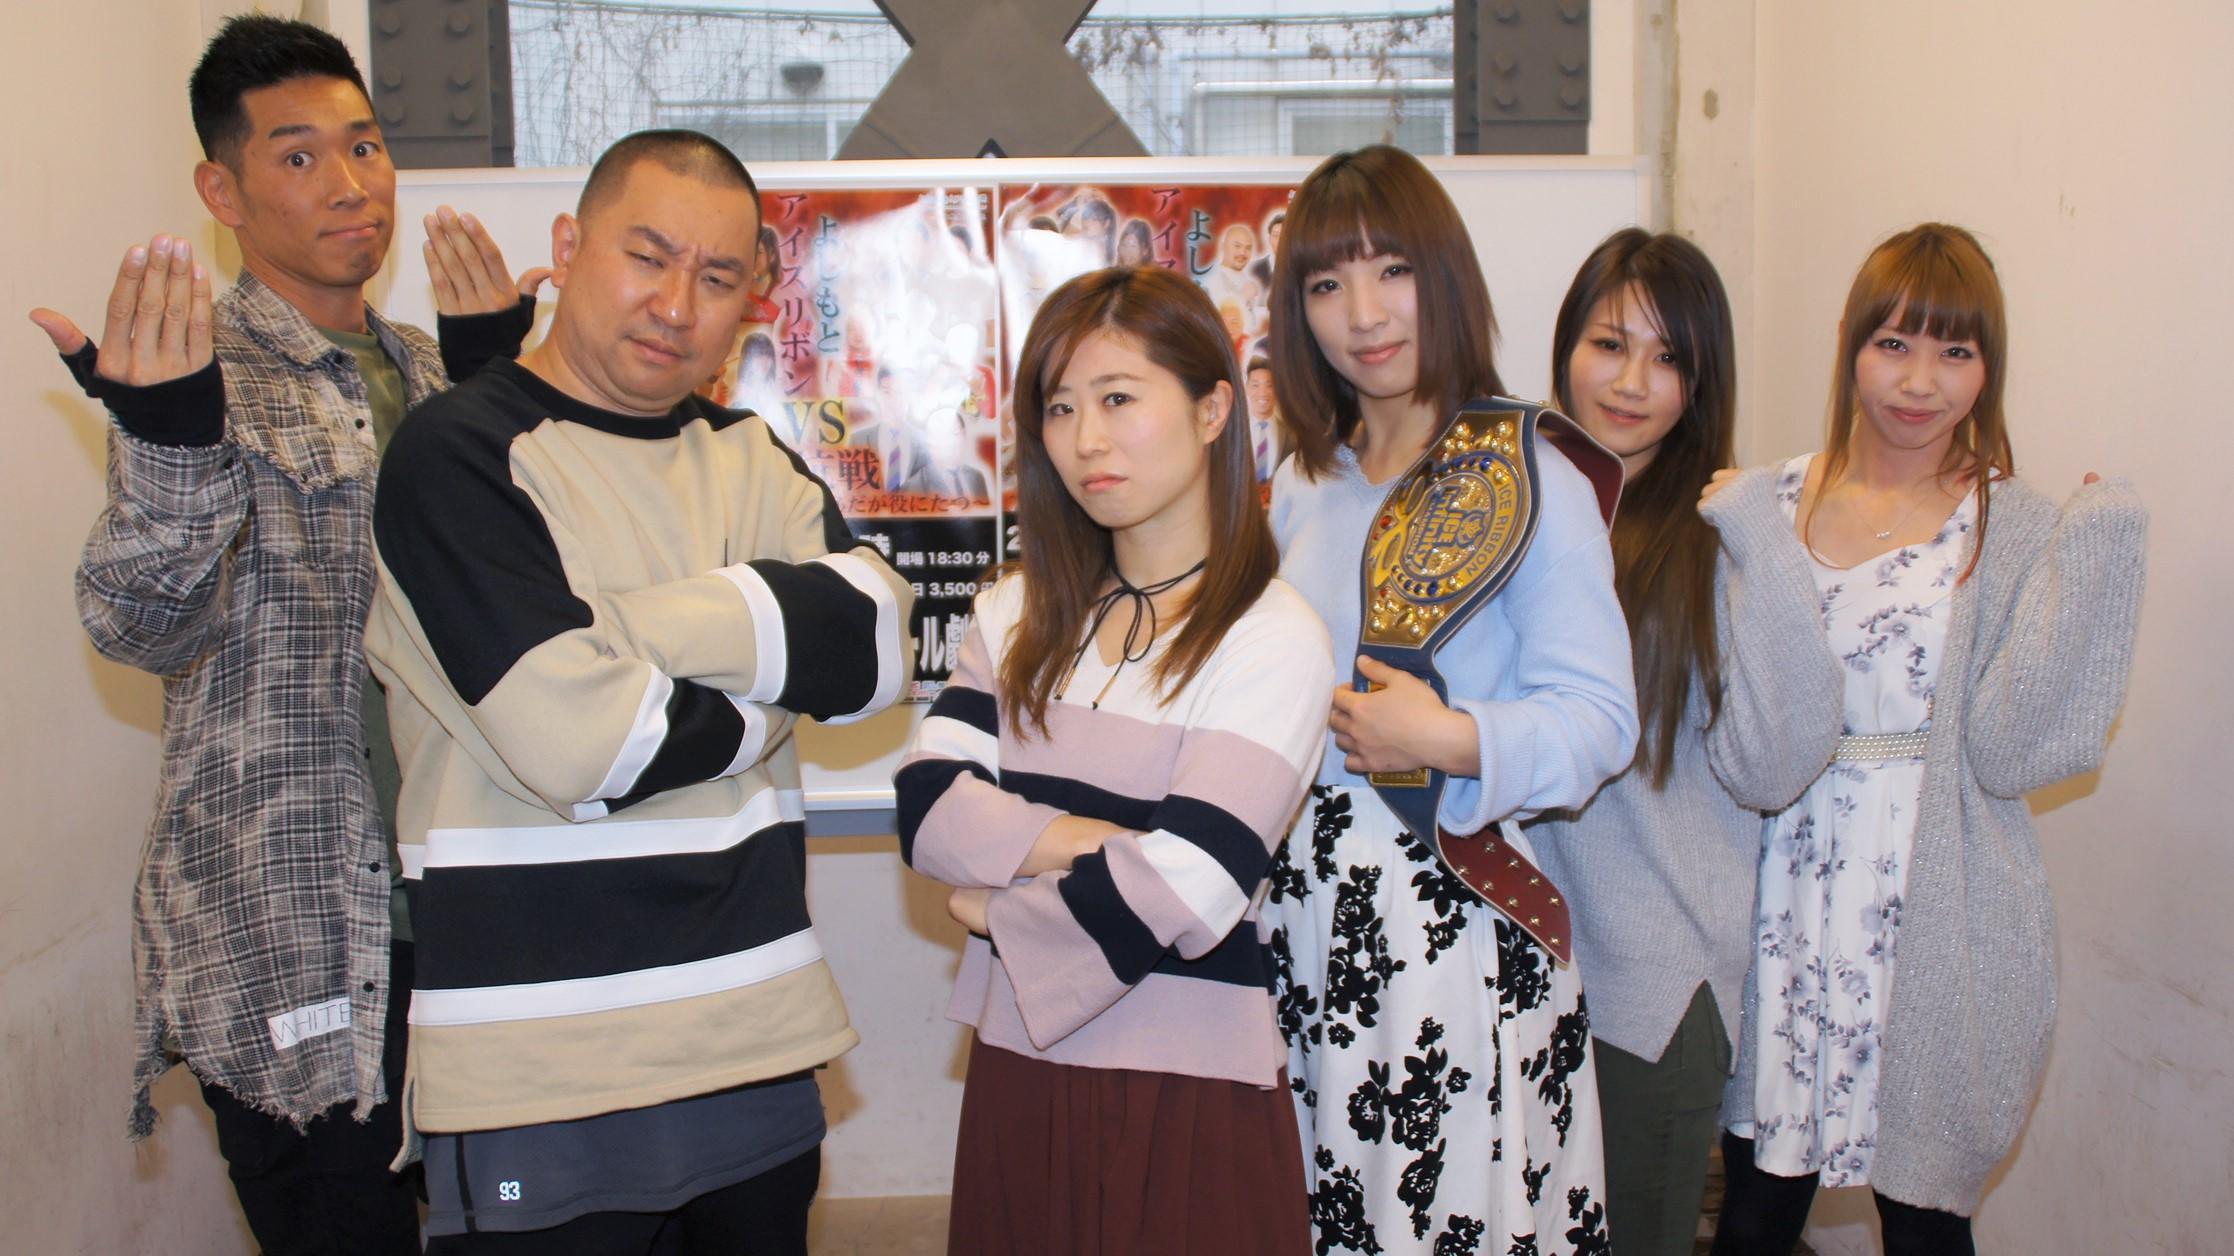 http://news.yoshimoto.co.jp/20170125133126-22ffe619735ee9d2a7956877da2a63ae837e3152.jpg